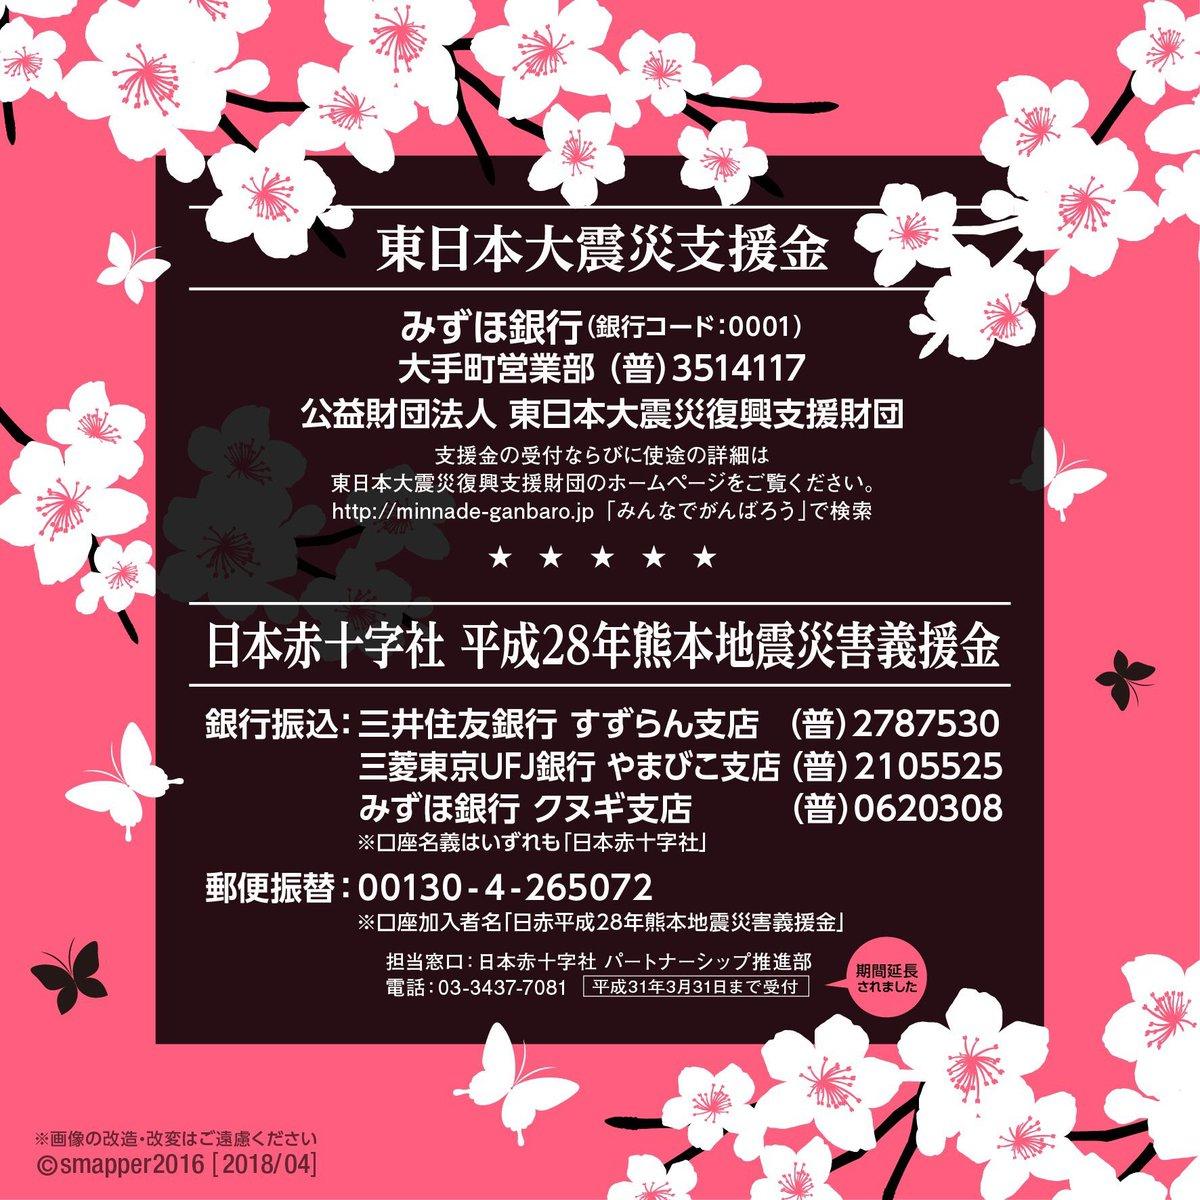 RT @maa6121: 被災地の復興にはまだ多くの応援が必要です。東日本大震災、熊本大分地震へのご